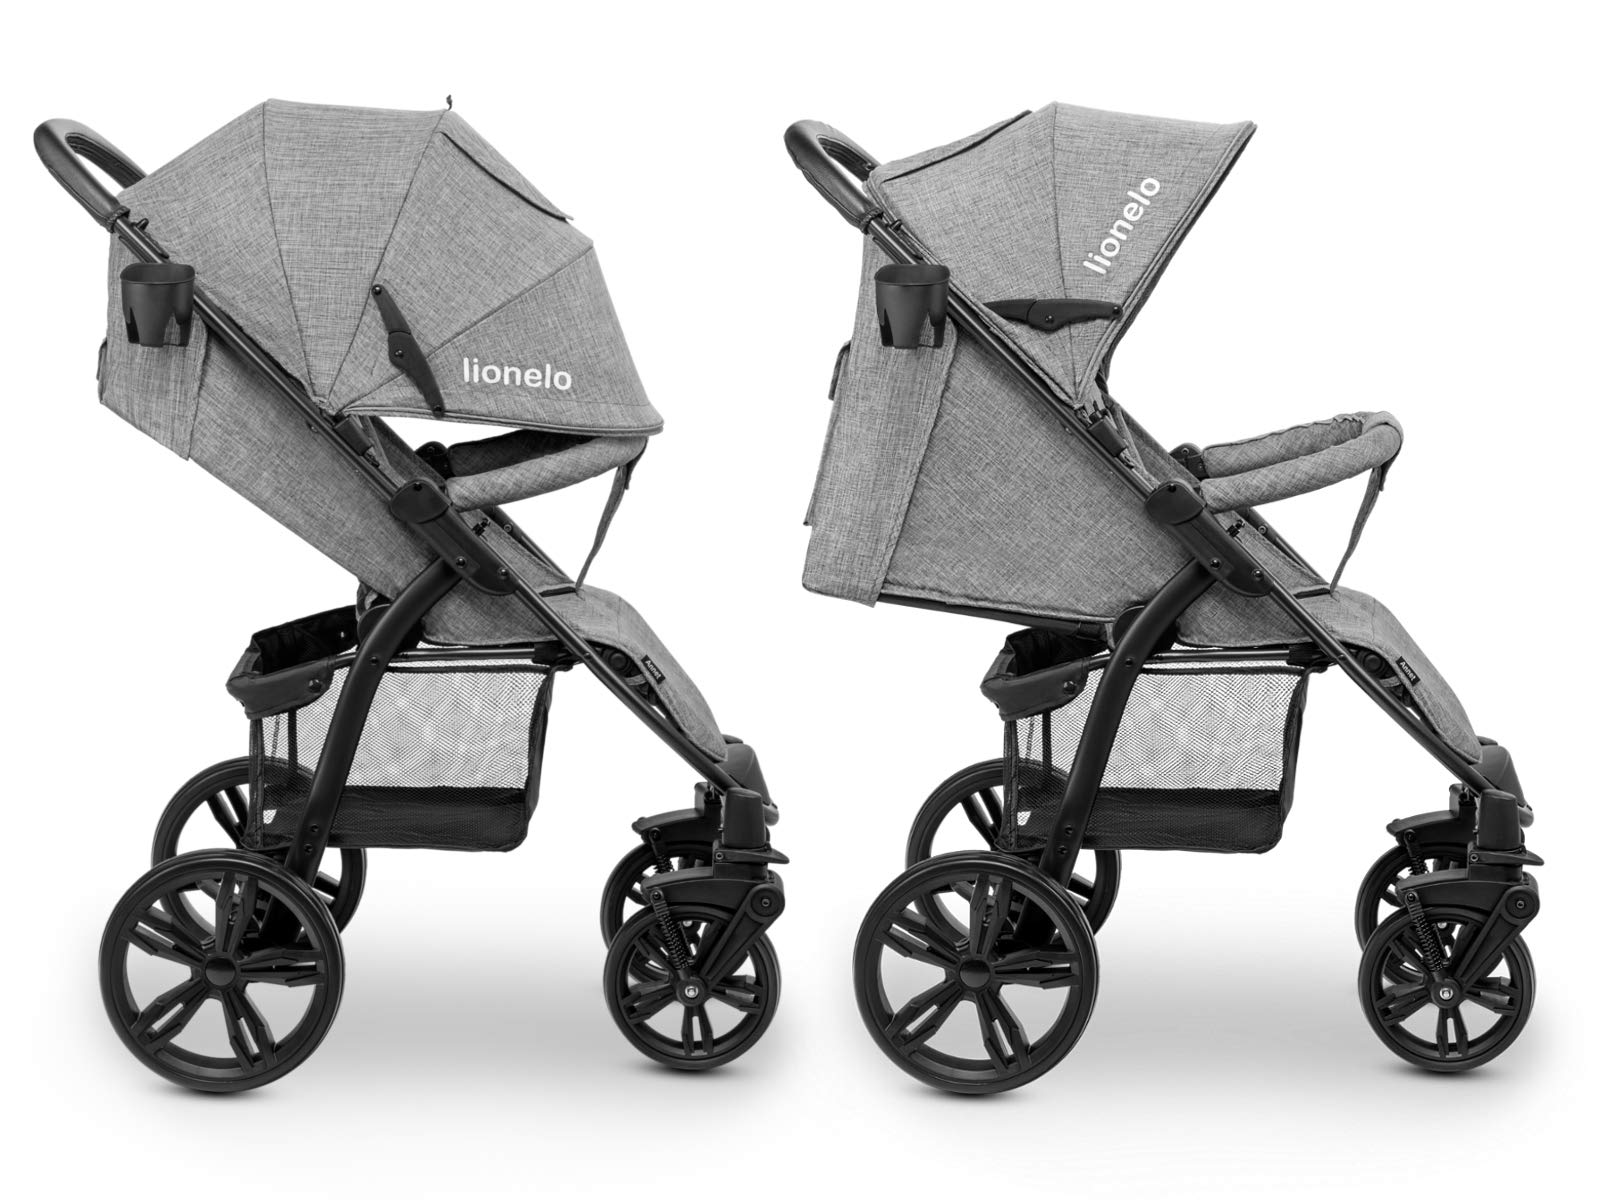 Lionelo 5902581656278 LO-Annet Concrete Stroller Pushchair (Light-Gray)   5